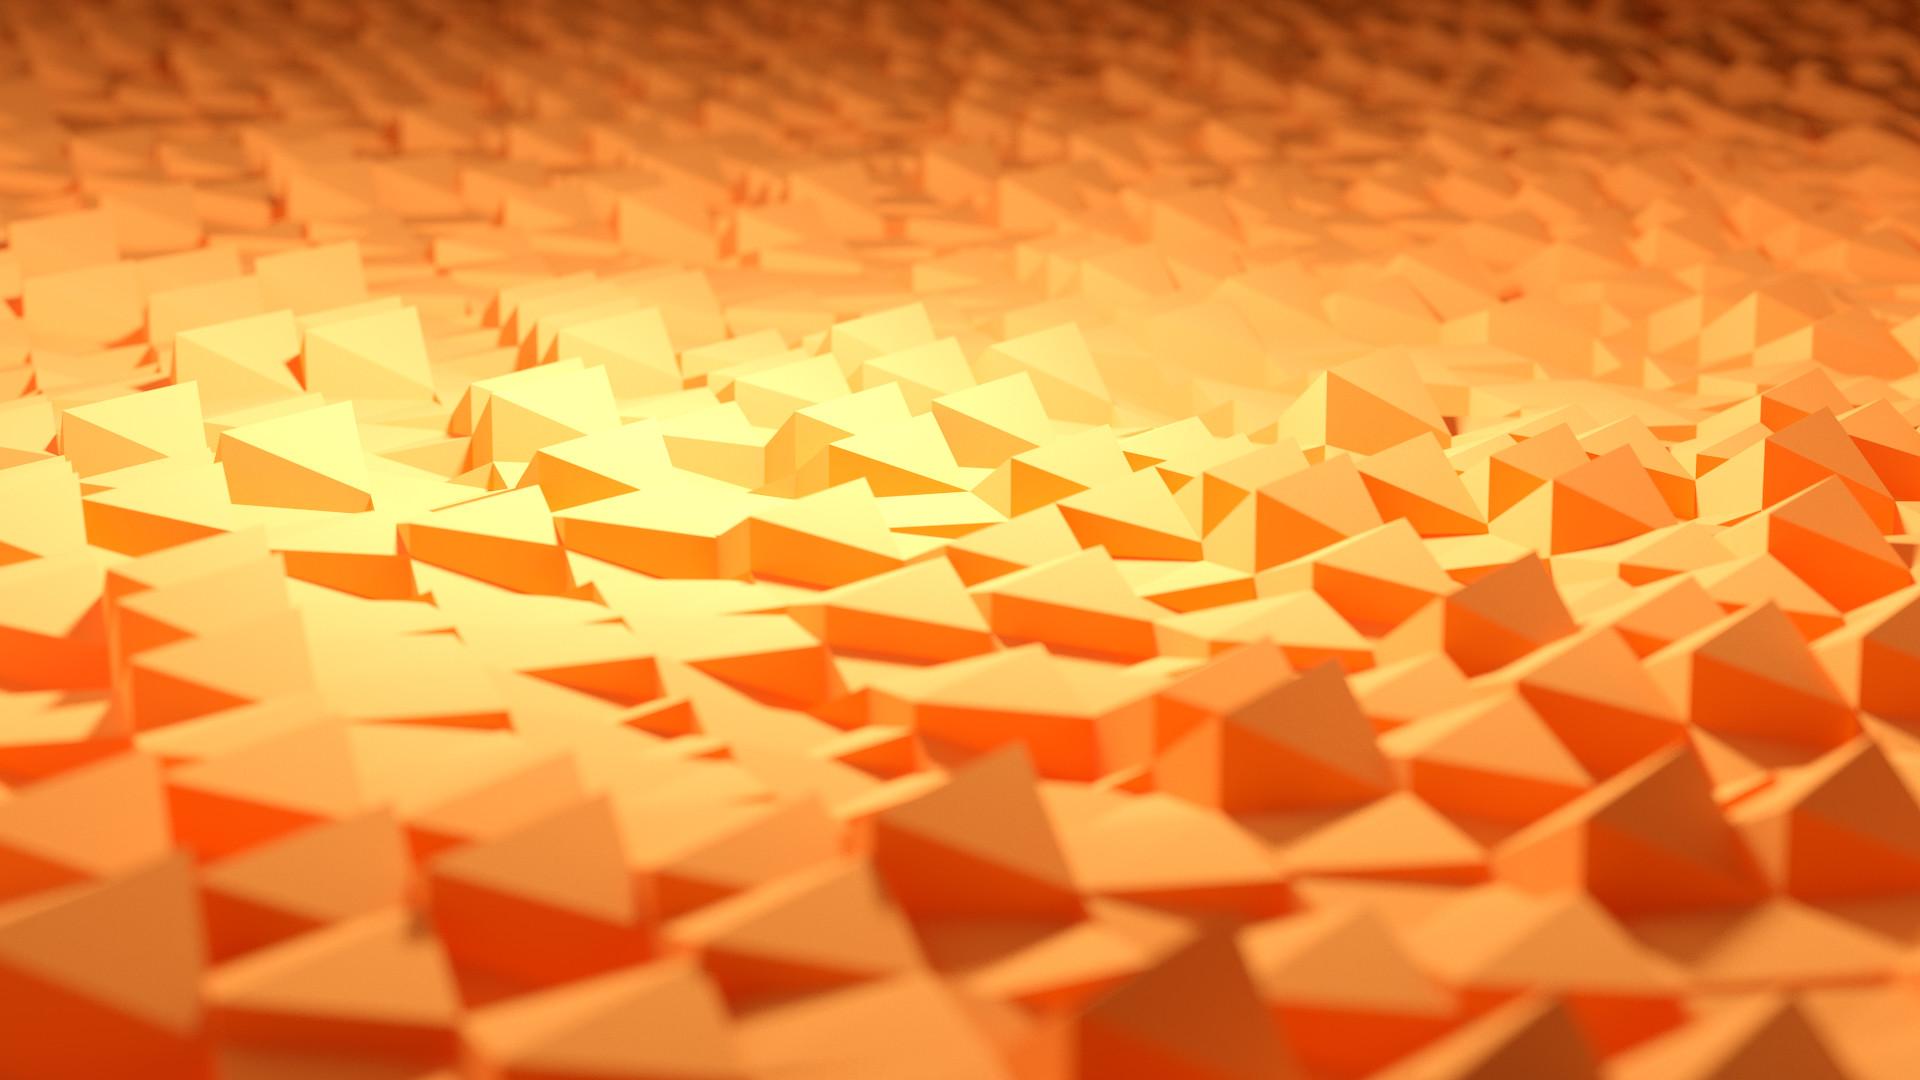 rendering-triangle-geometry-texture-desktop-wallpaper-hd-geometric-wallpaper -hd-free-wallpapers-backgrounds-images-fhd-4k-download-2014-2015-2016.jpg